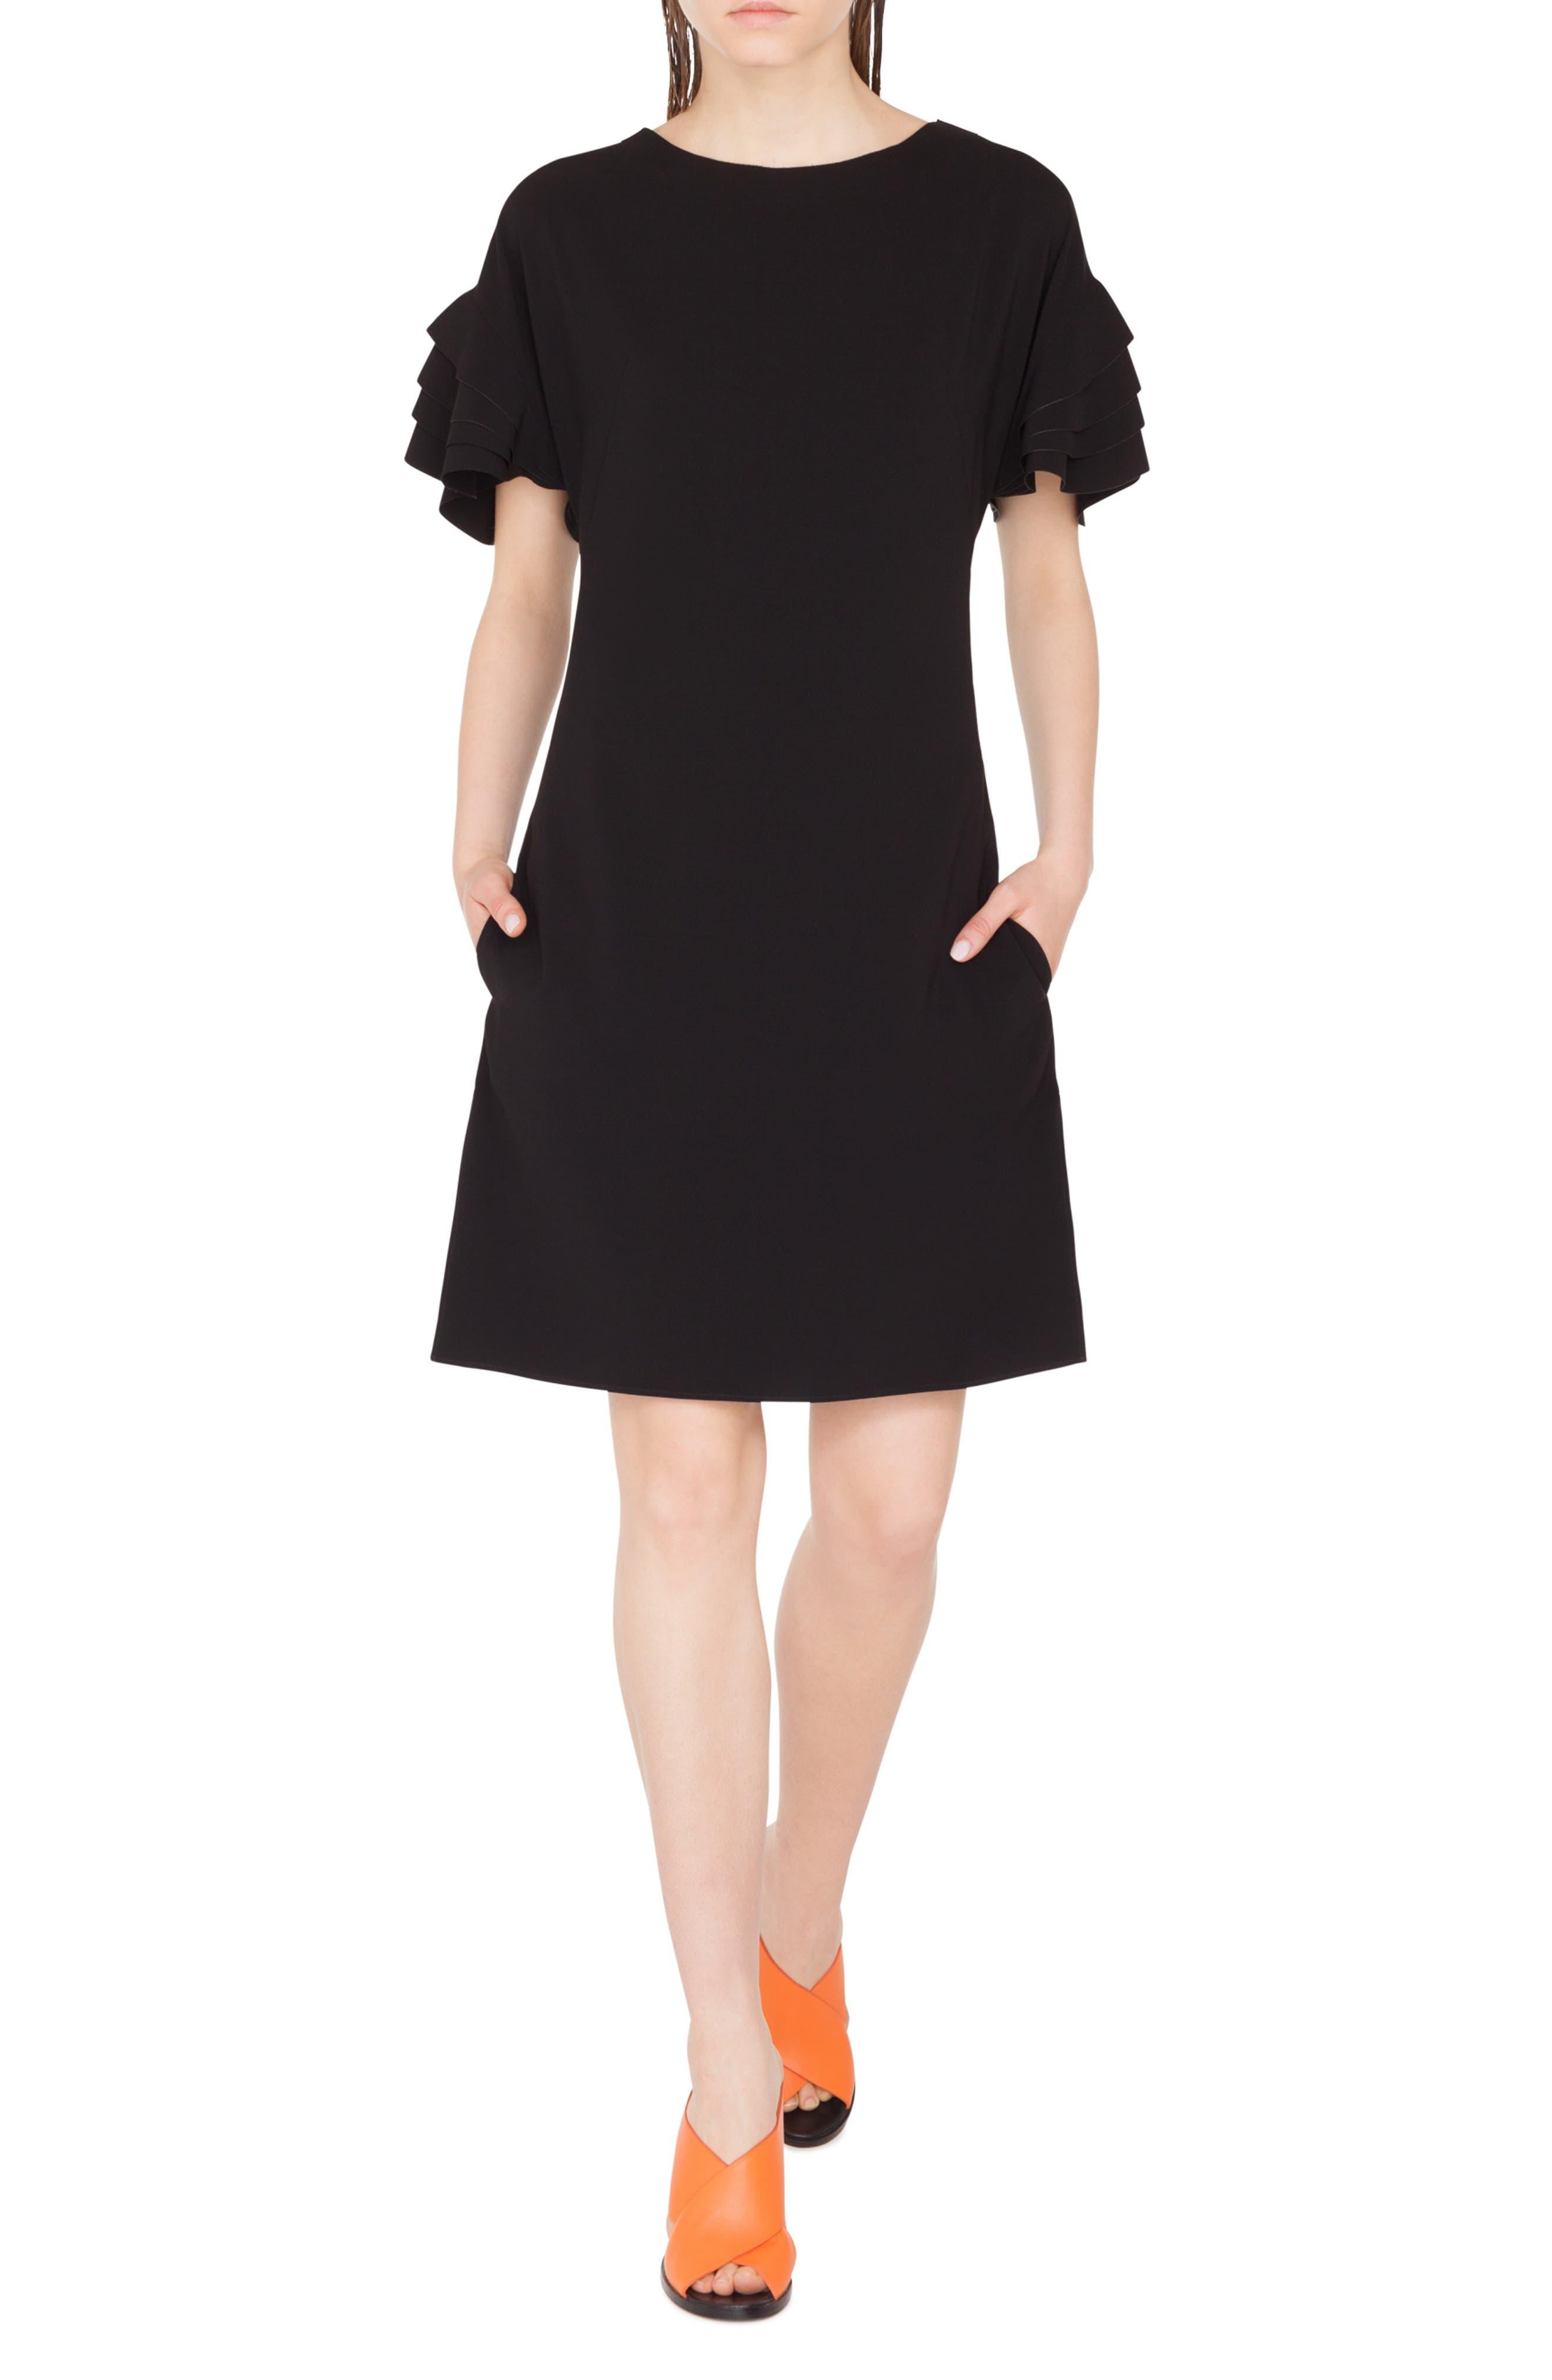 AKRIS PUNTO,                             Layered Sleeve Dress,                             Main thumbnail 1, color,                             NERO